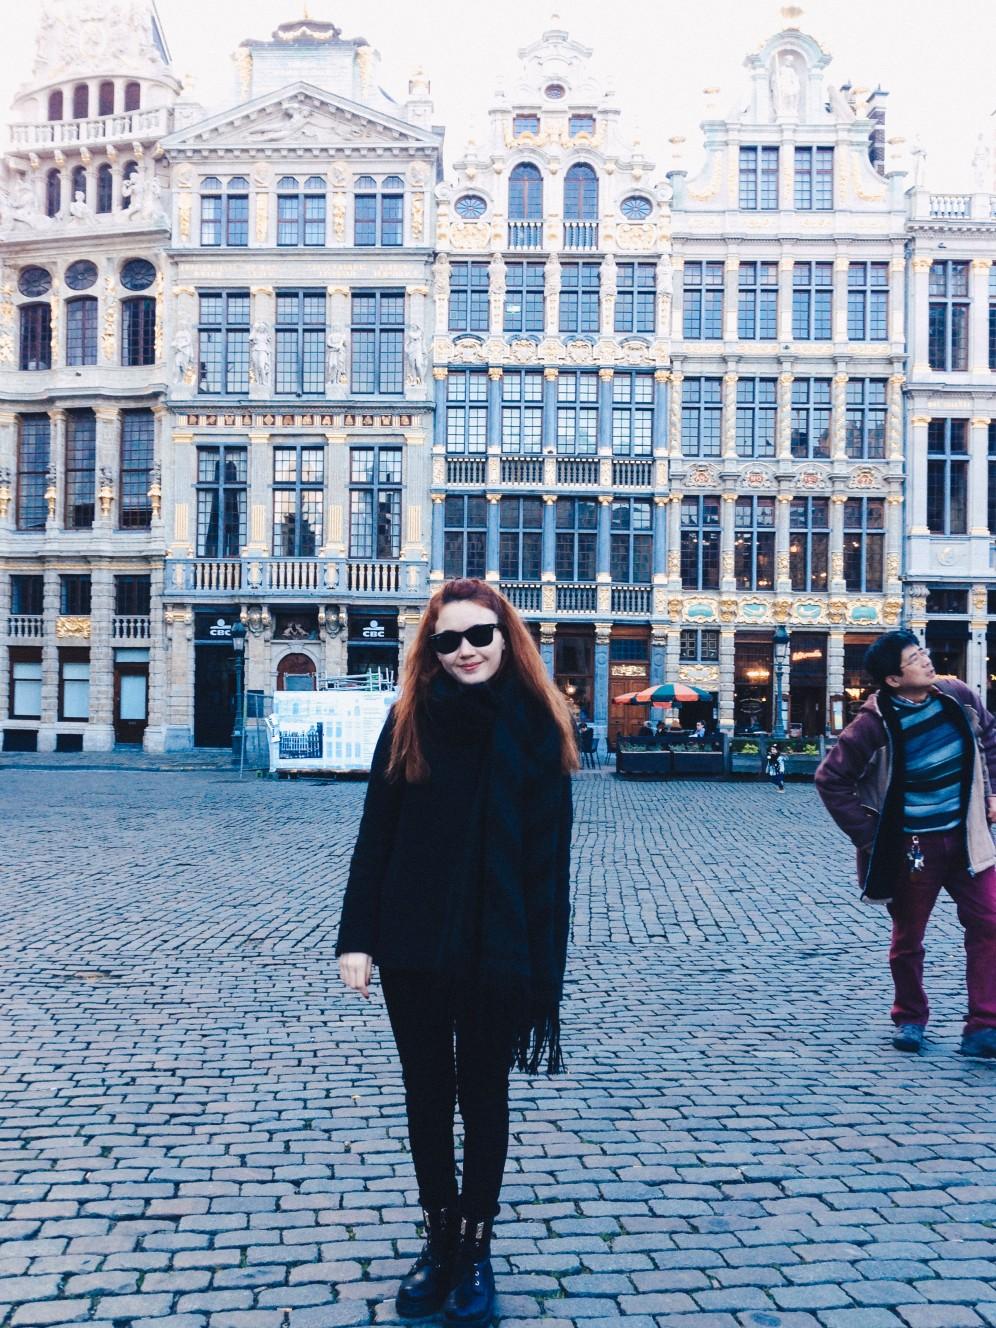 Grote Markt in Brussels